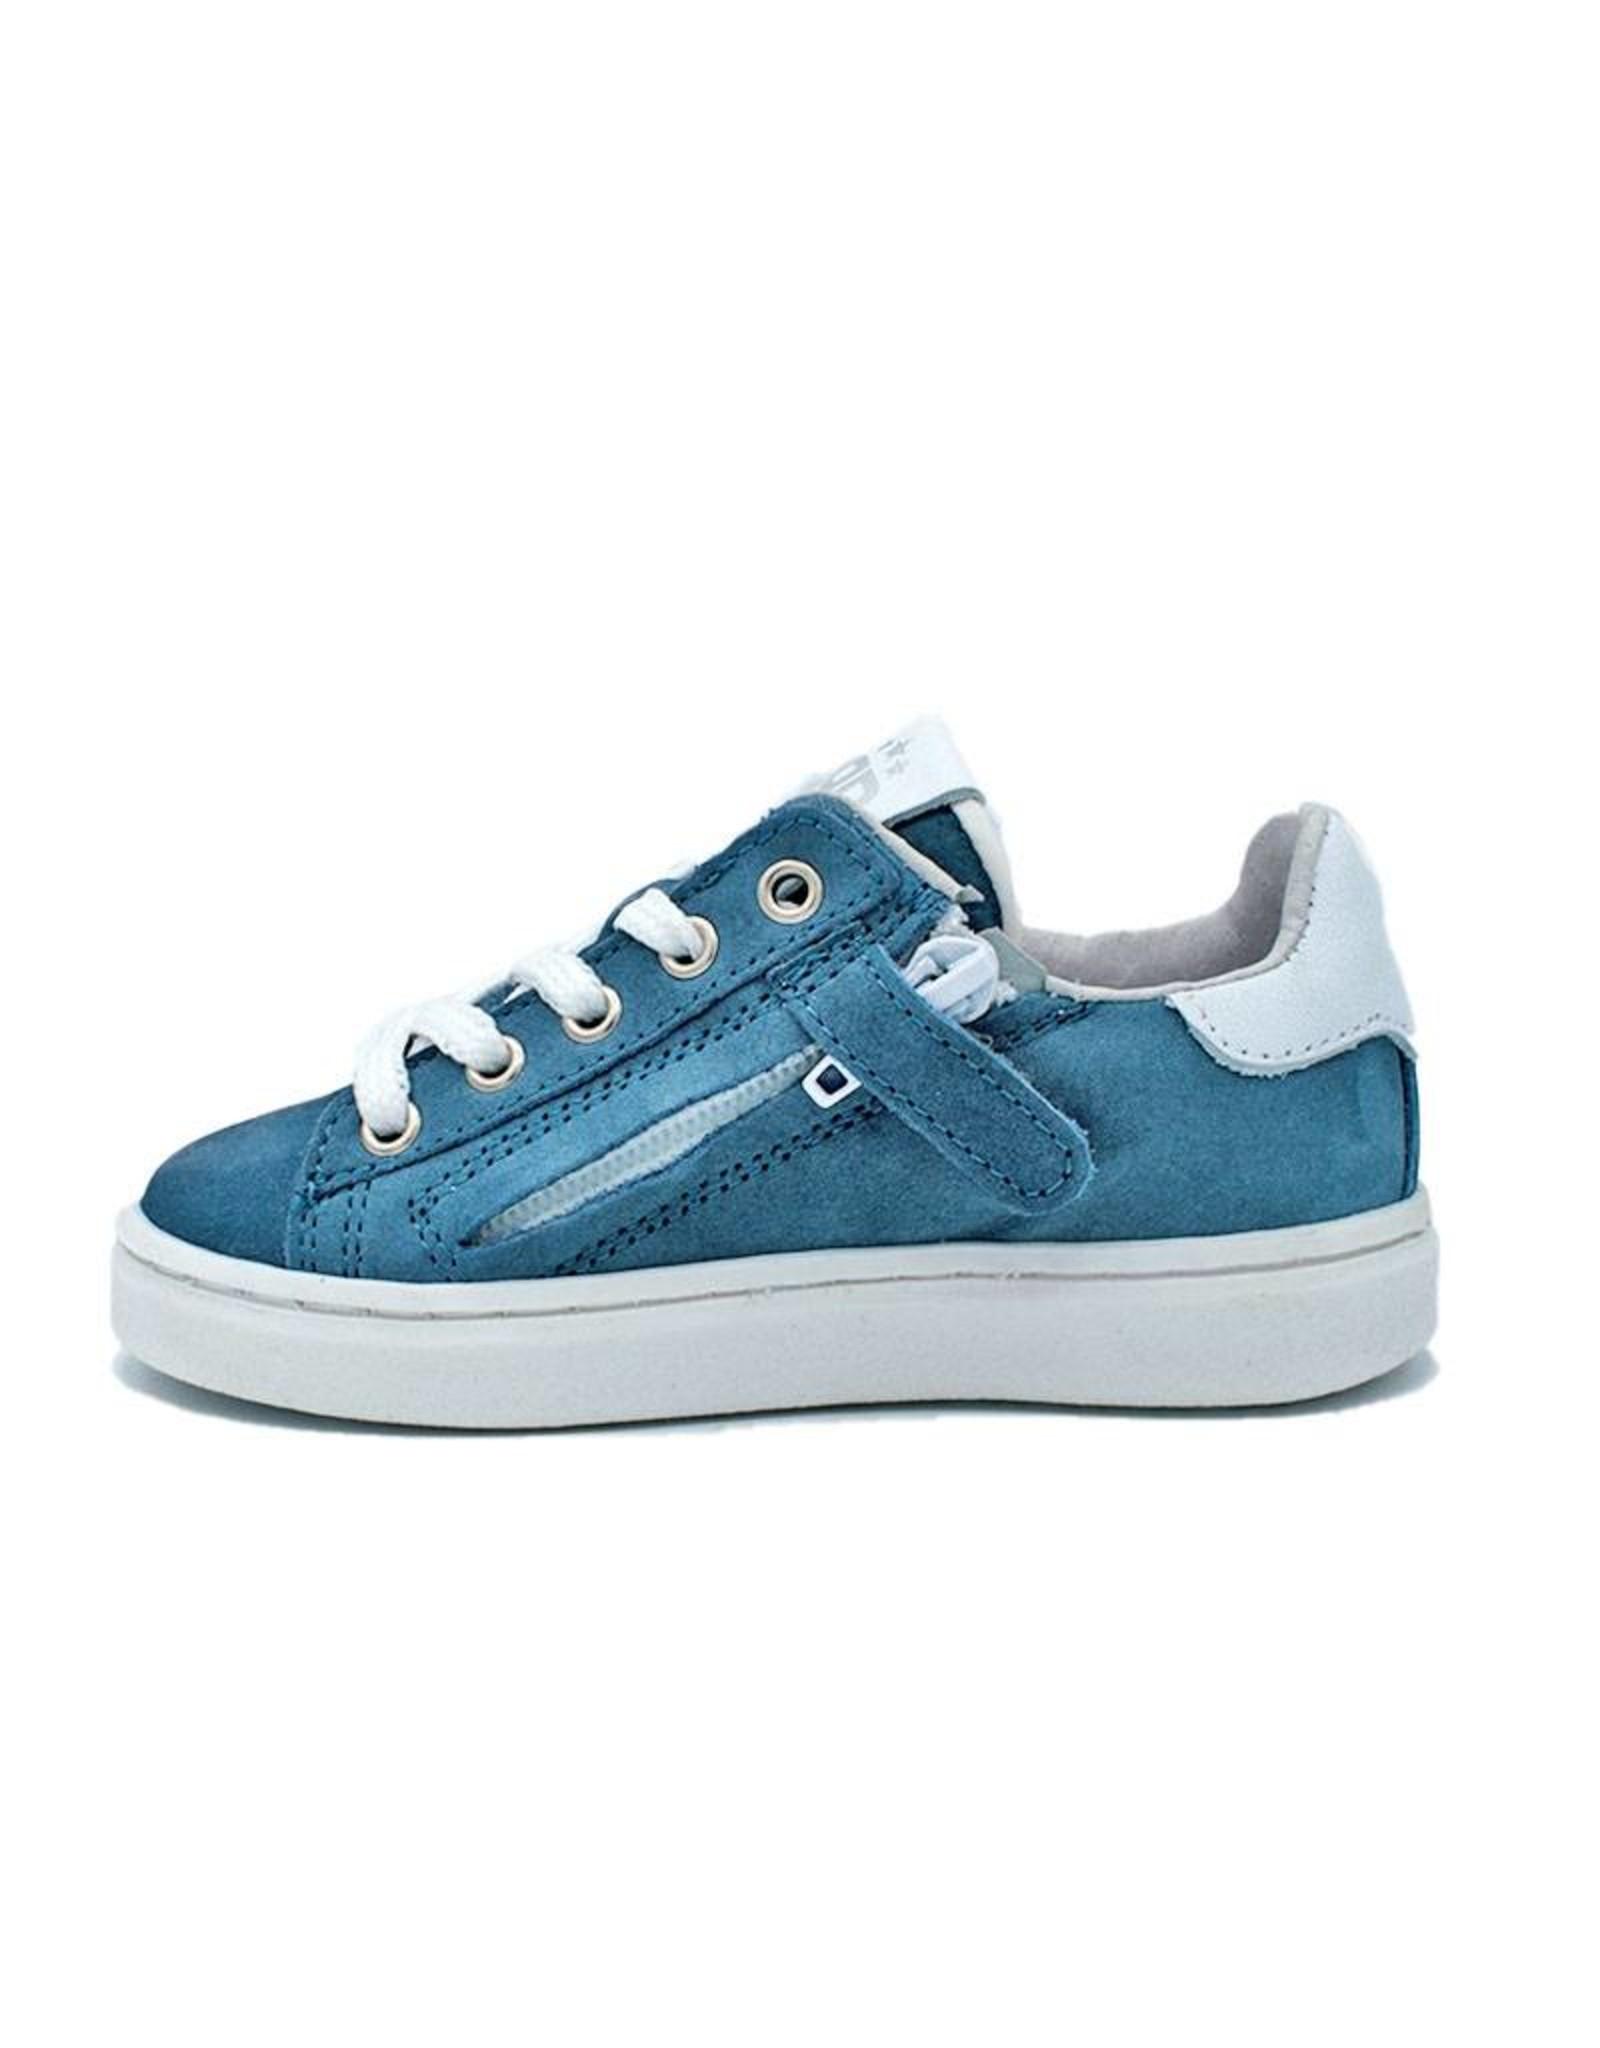 HIP HIP sneaker denim blauw